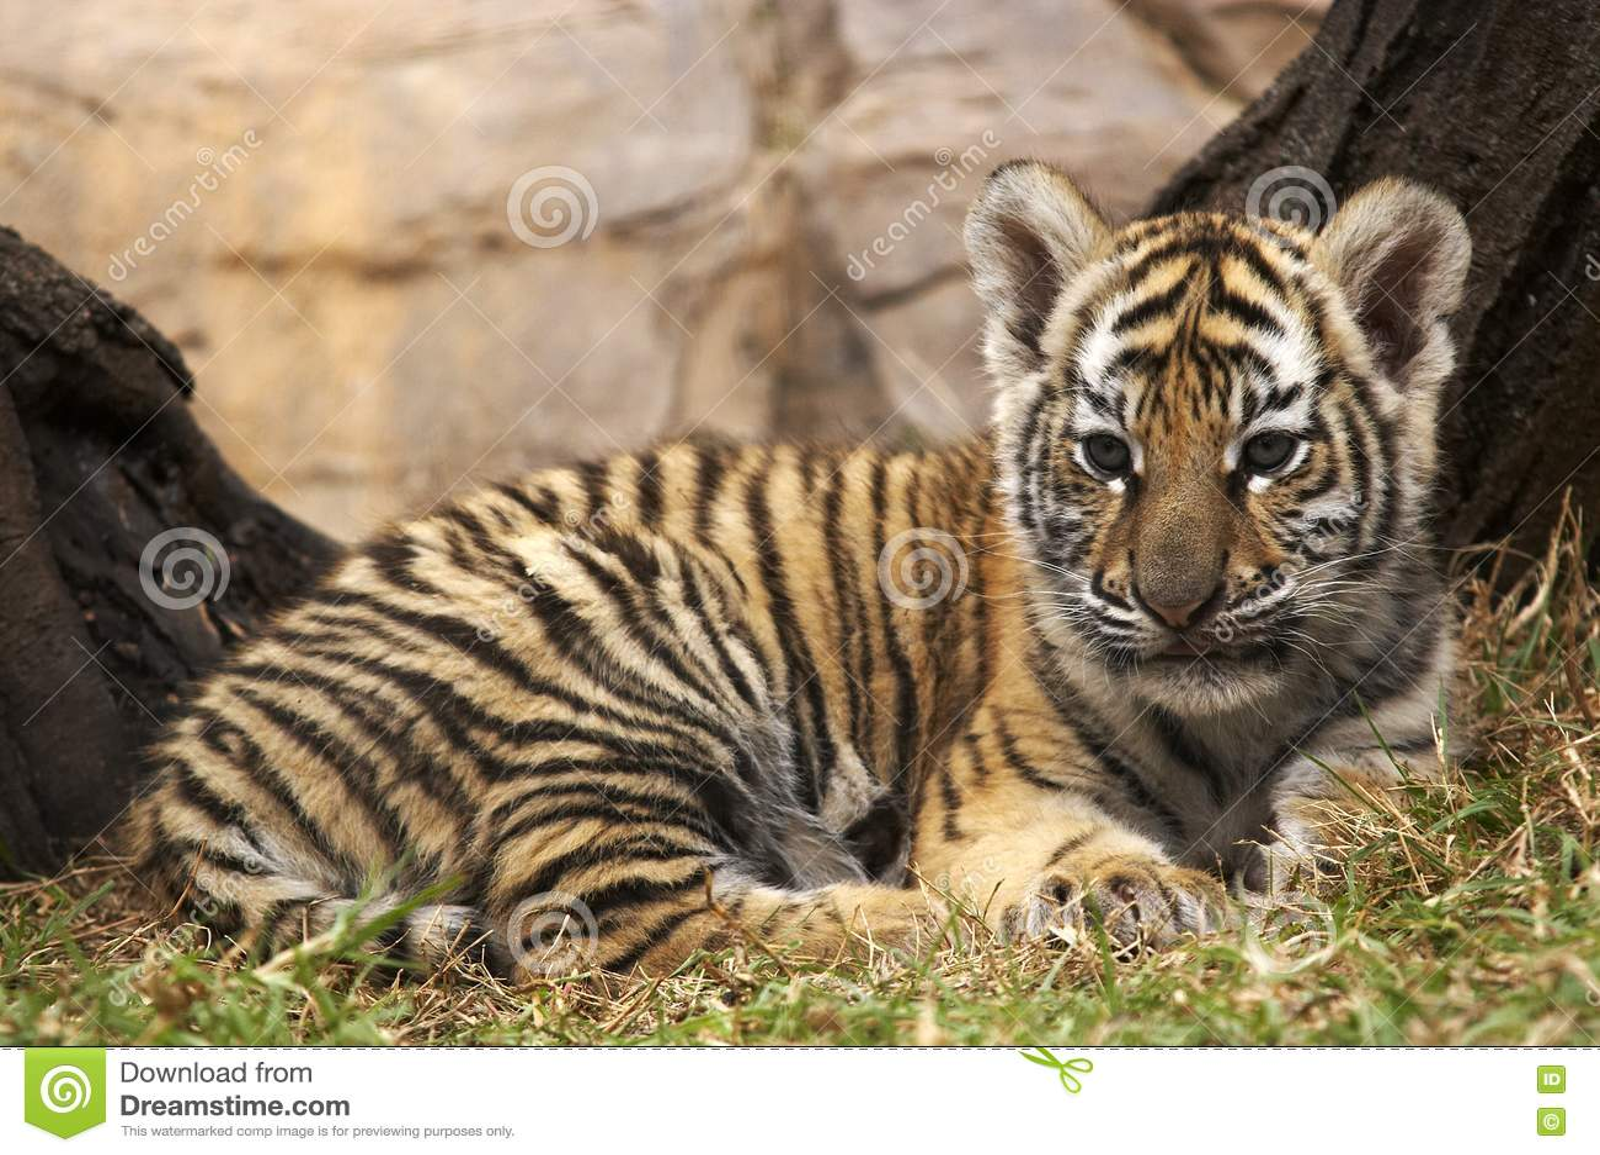 Little tiger 3